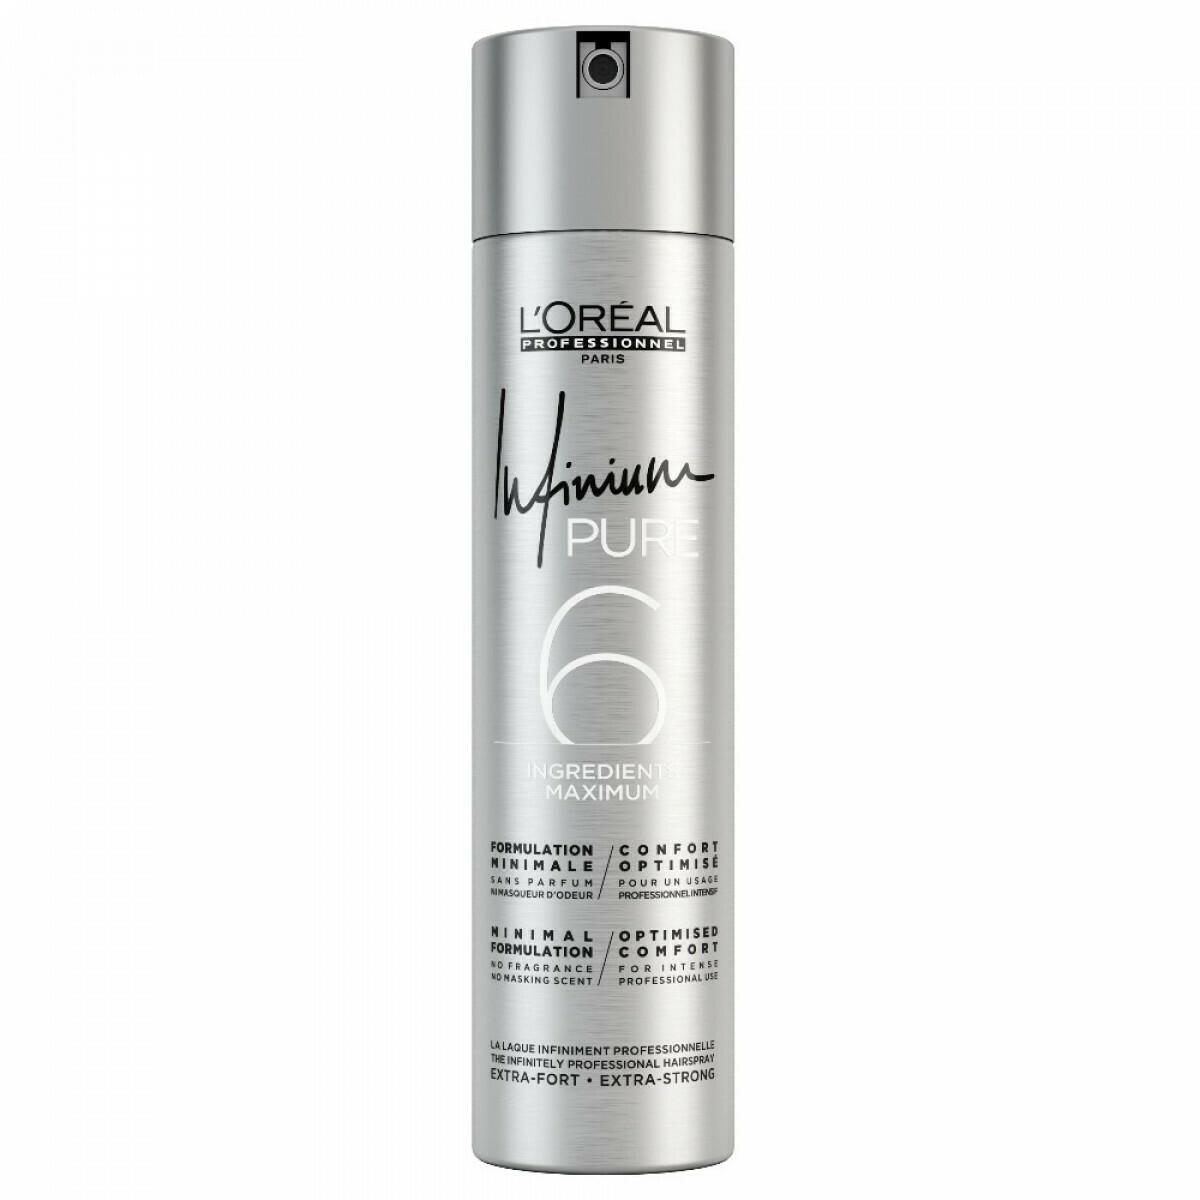 Laque Infinium Pure - 300ml - Infinium - Fixant souple L'Oréal Professionnel